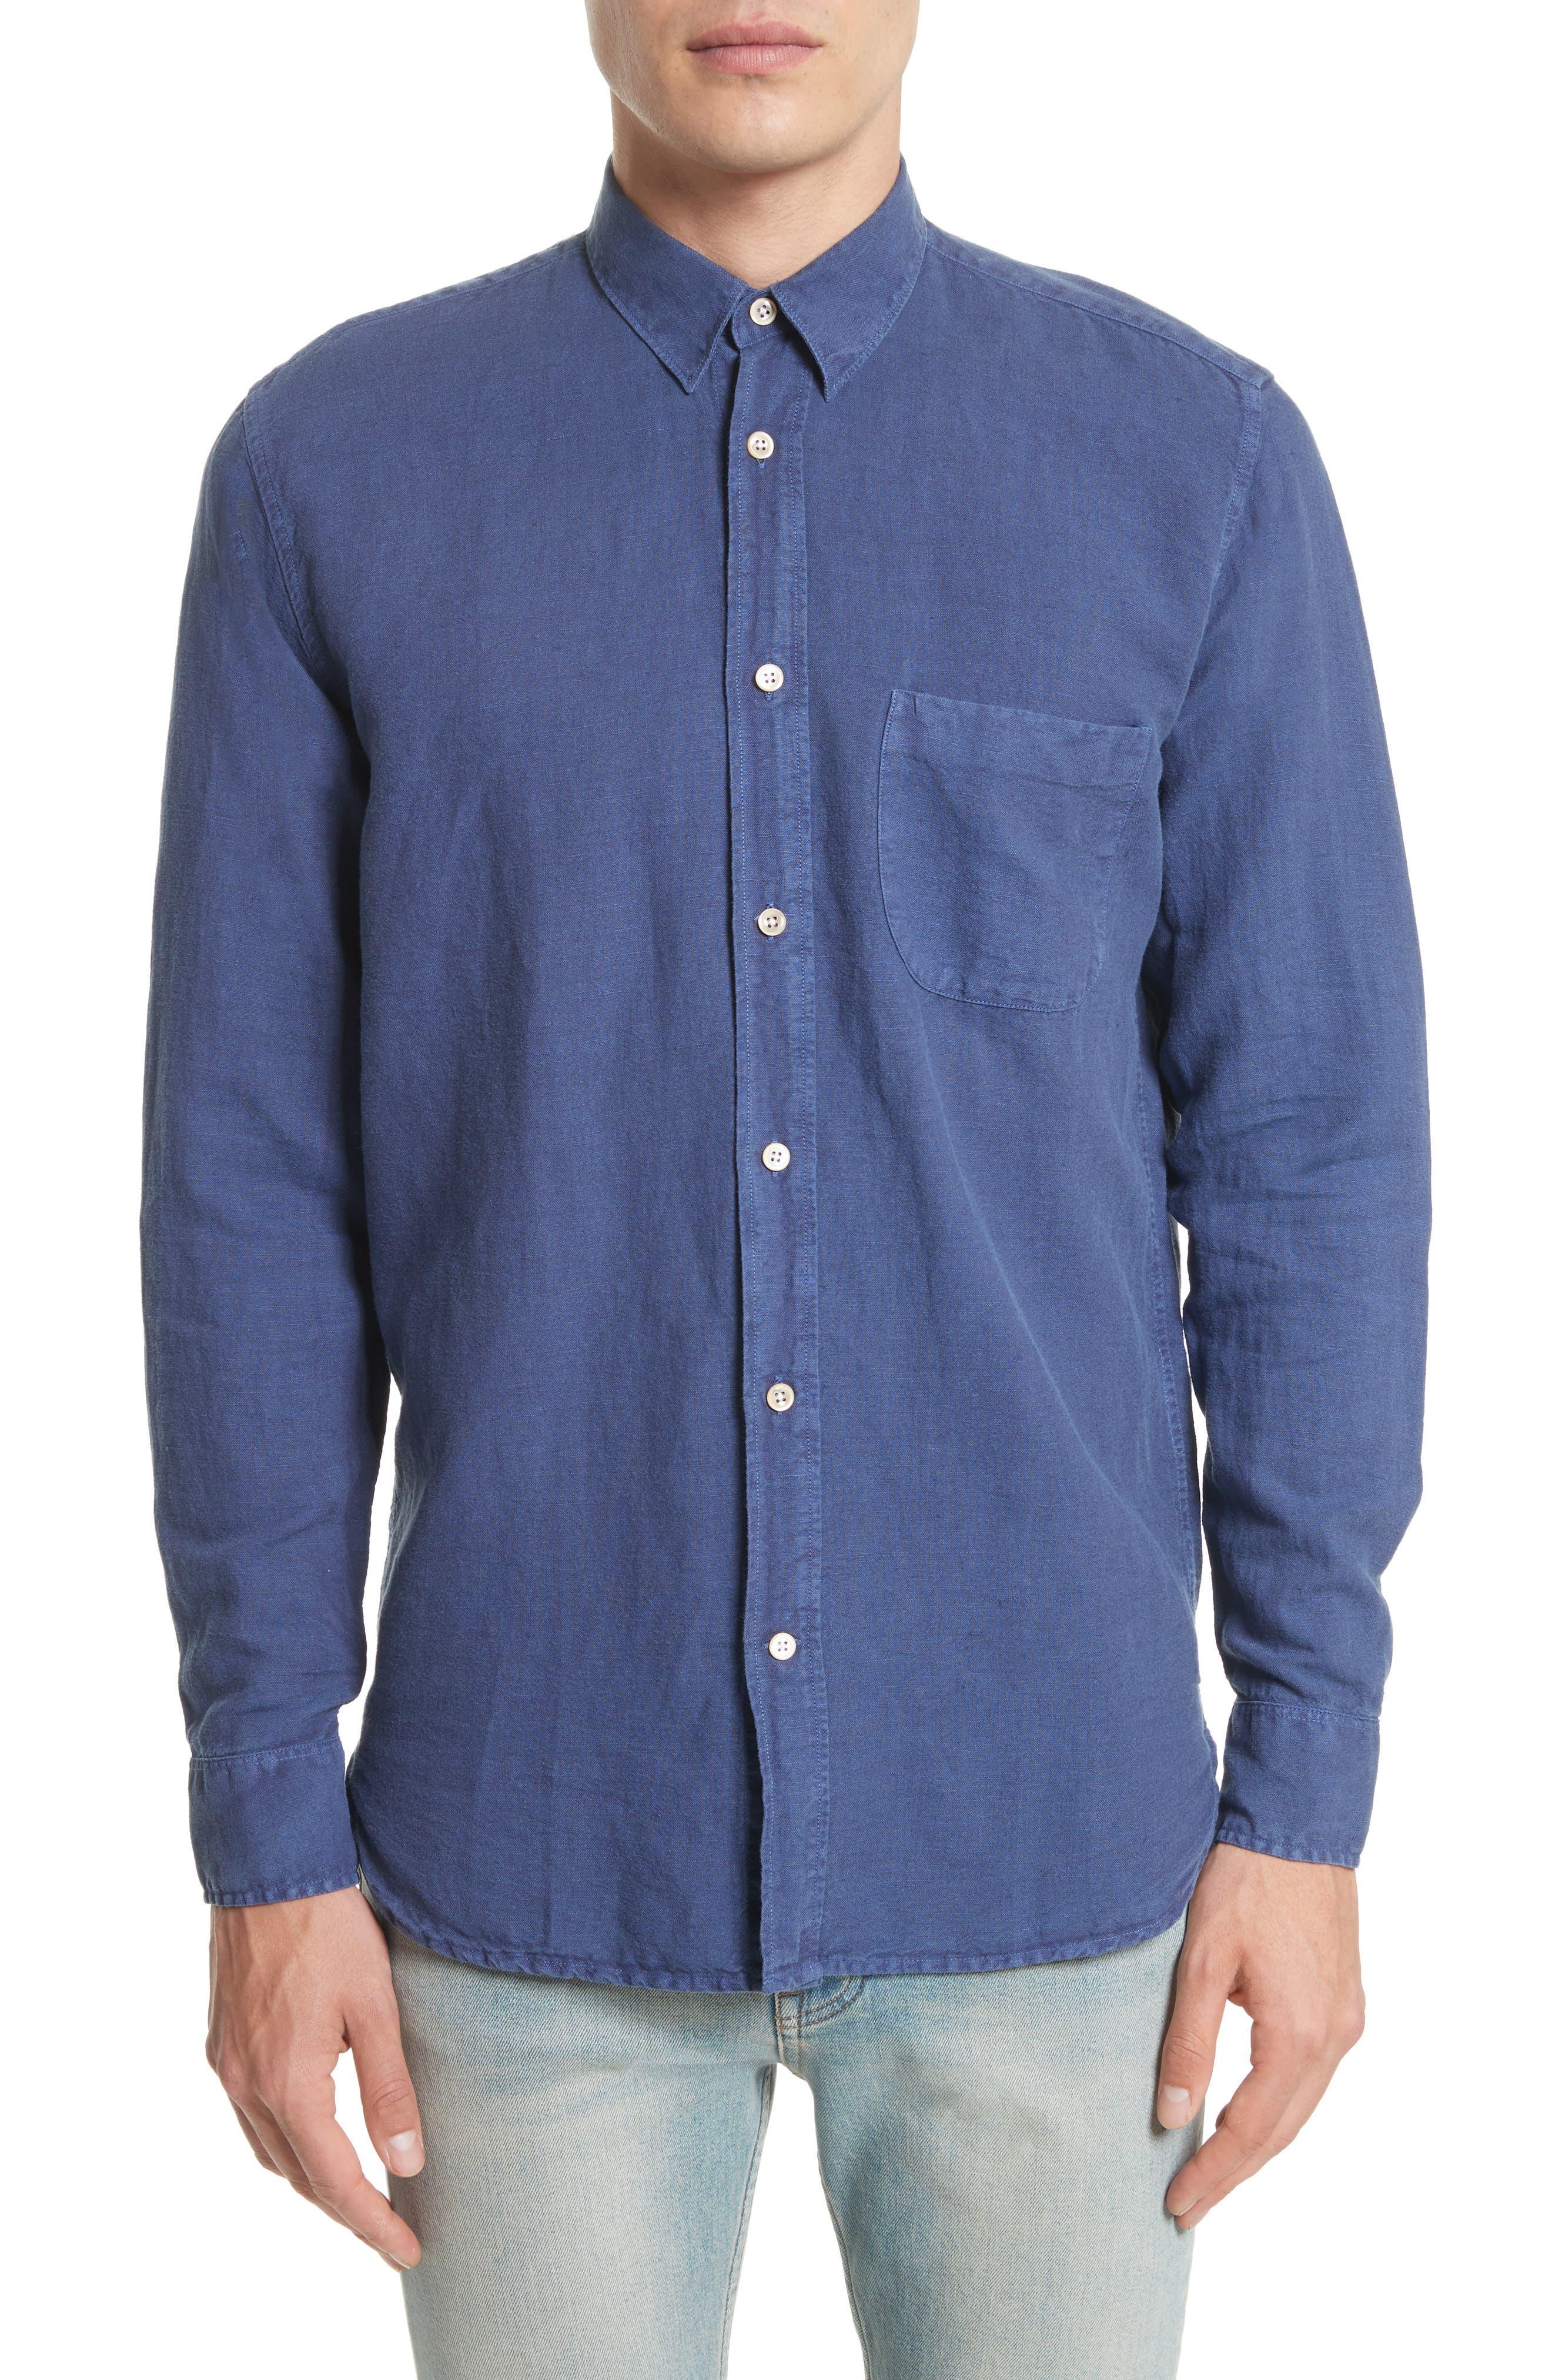 Main Image - OUR LEGACY Generation Linen & Cotton Sport Shirt